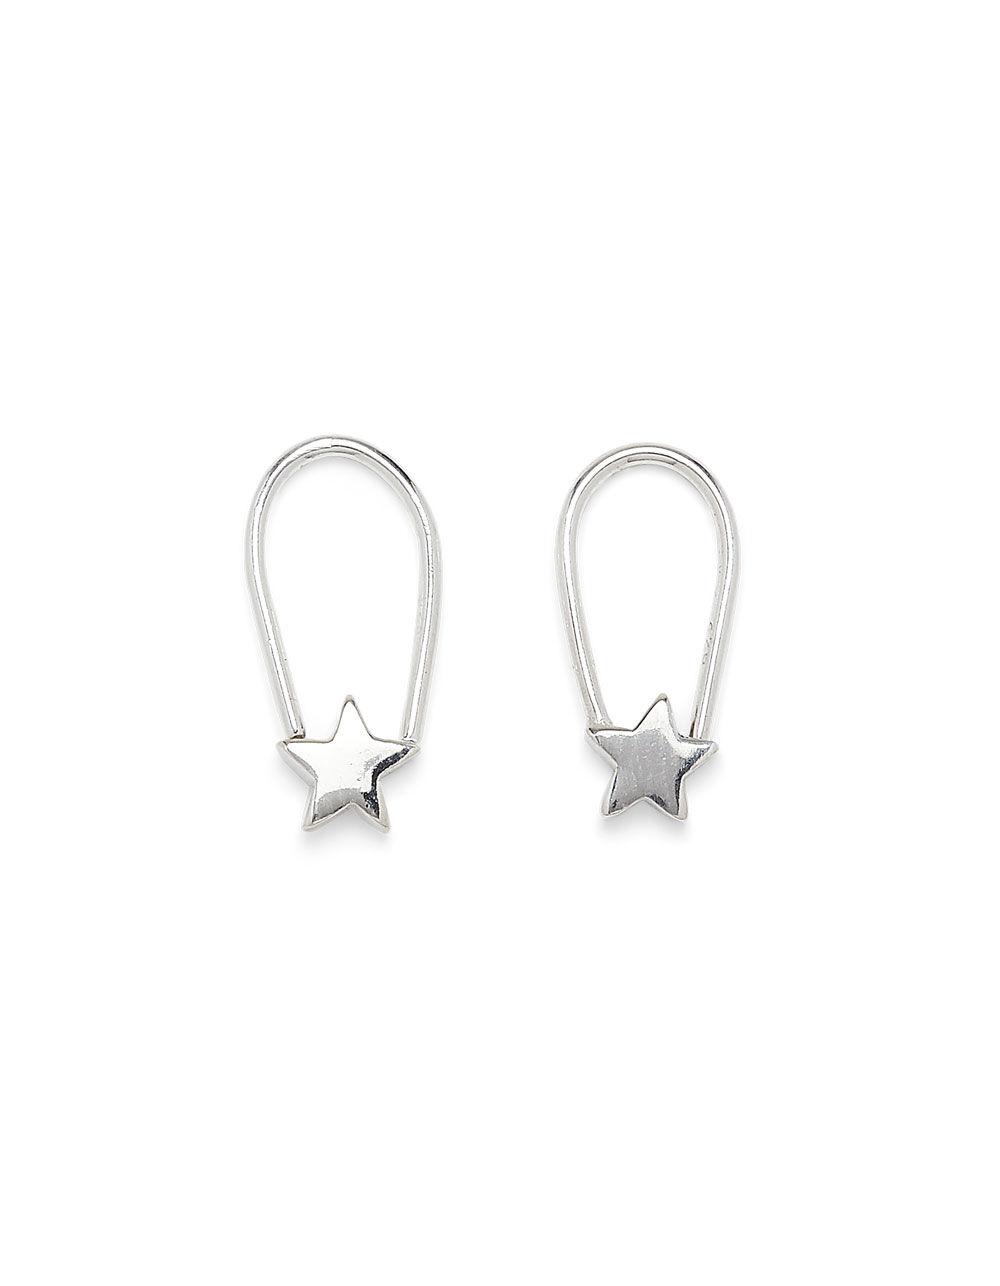 PURA VIDA Star Safety Pin Earrings